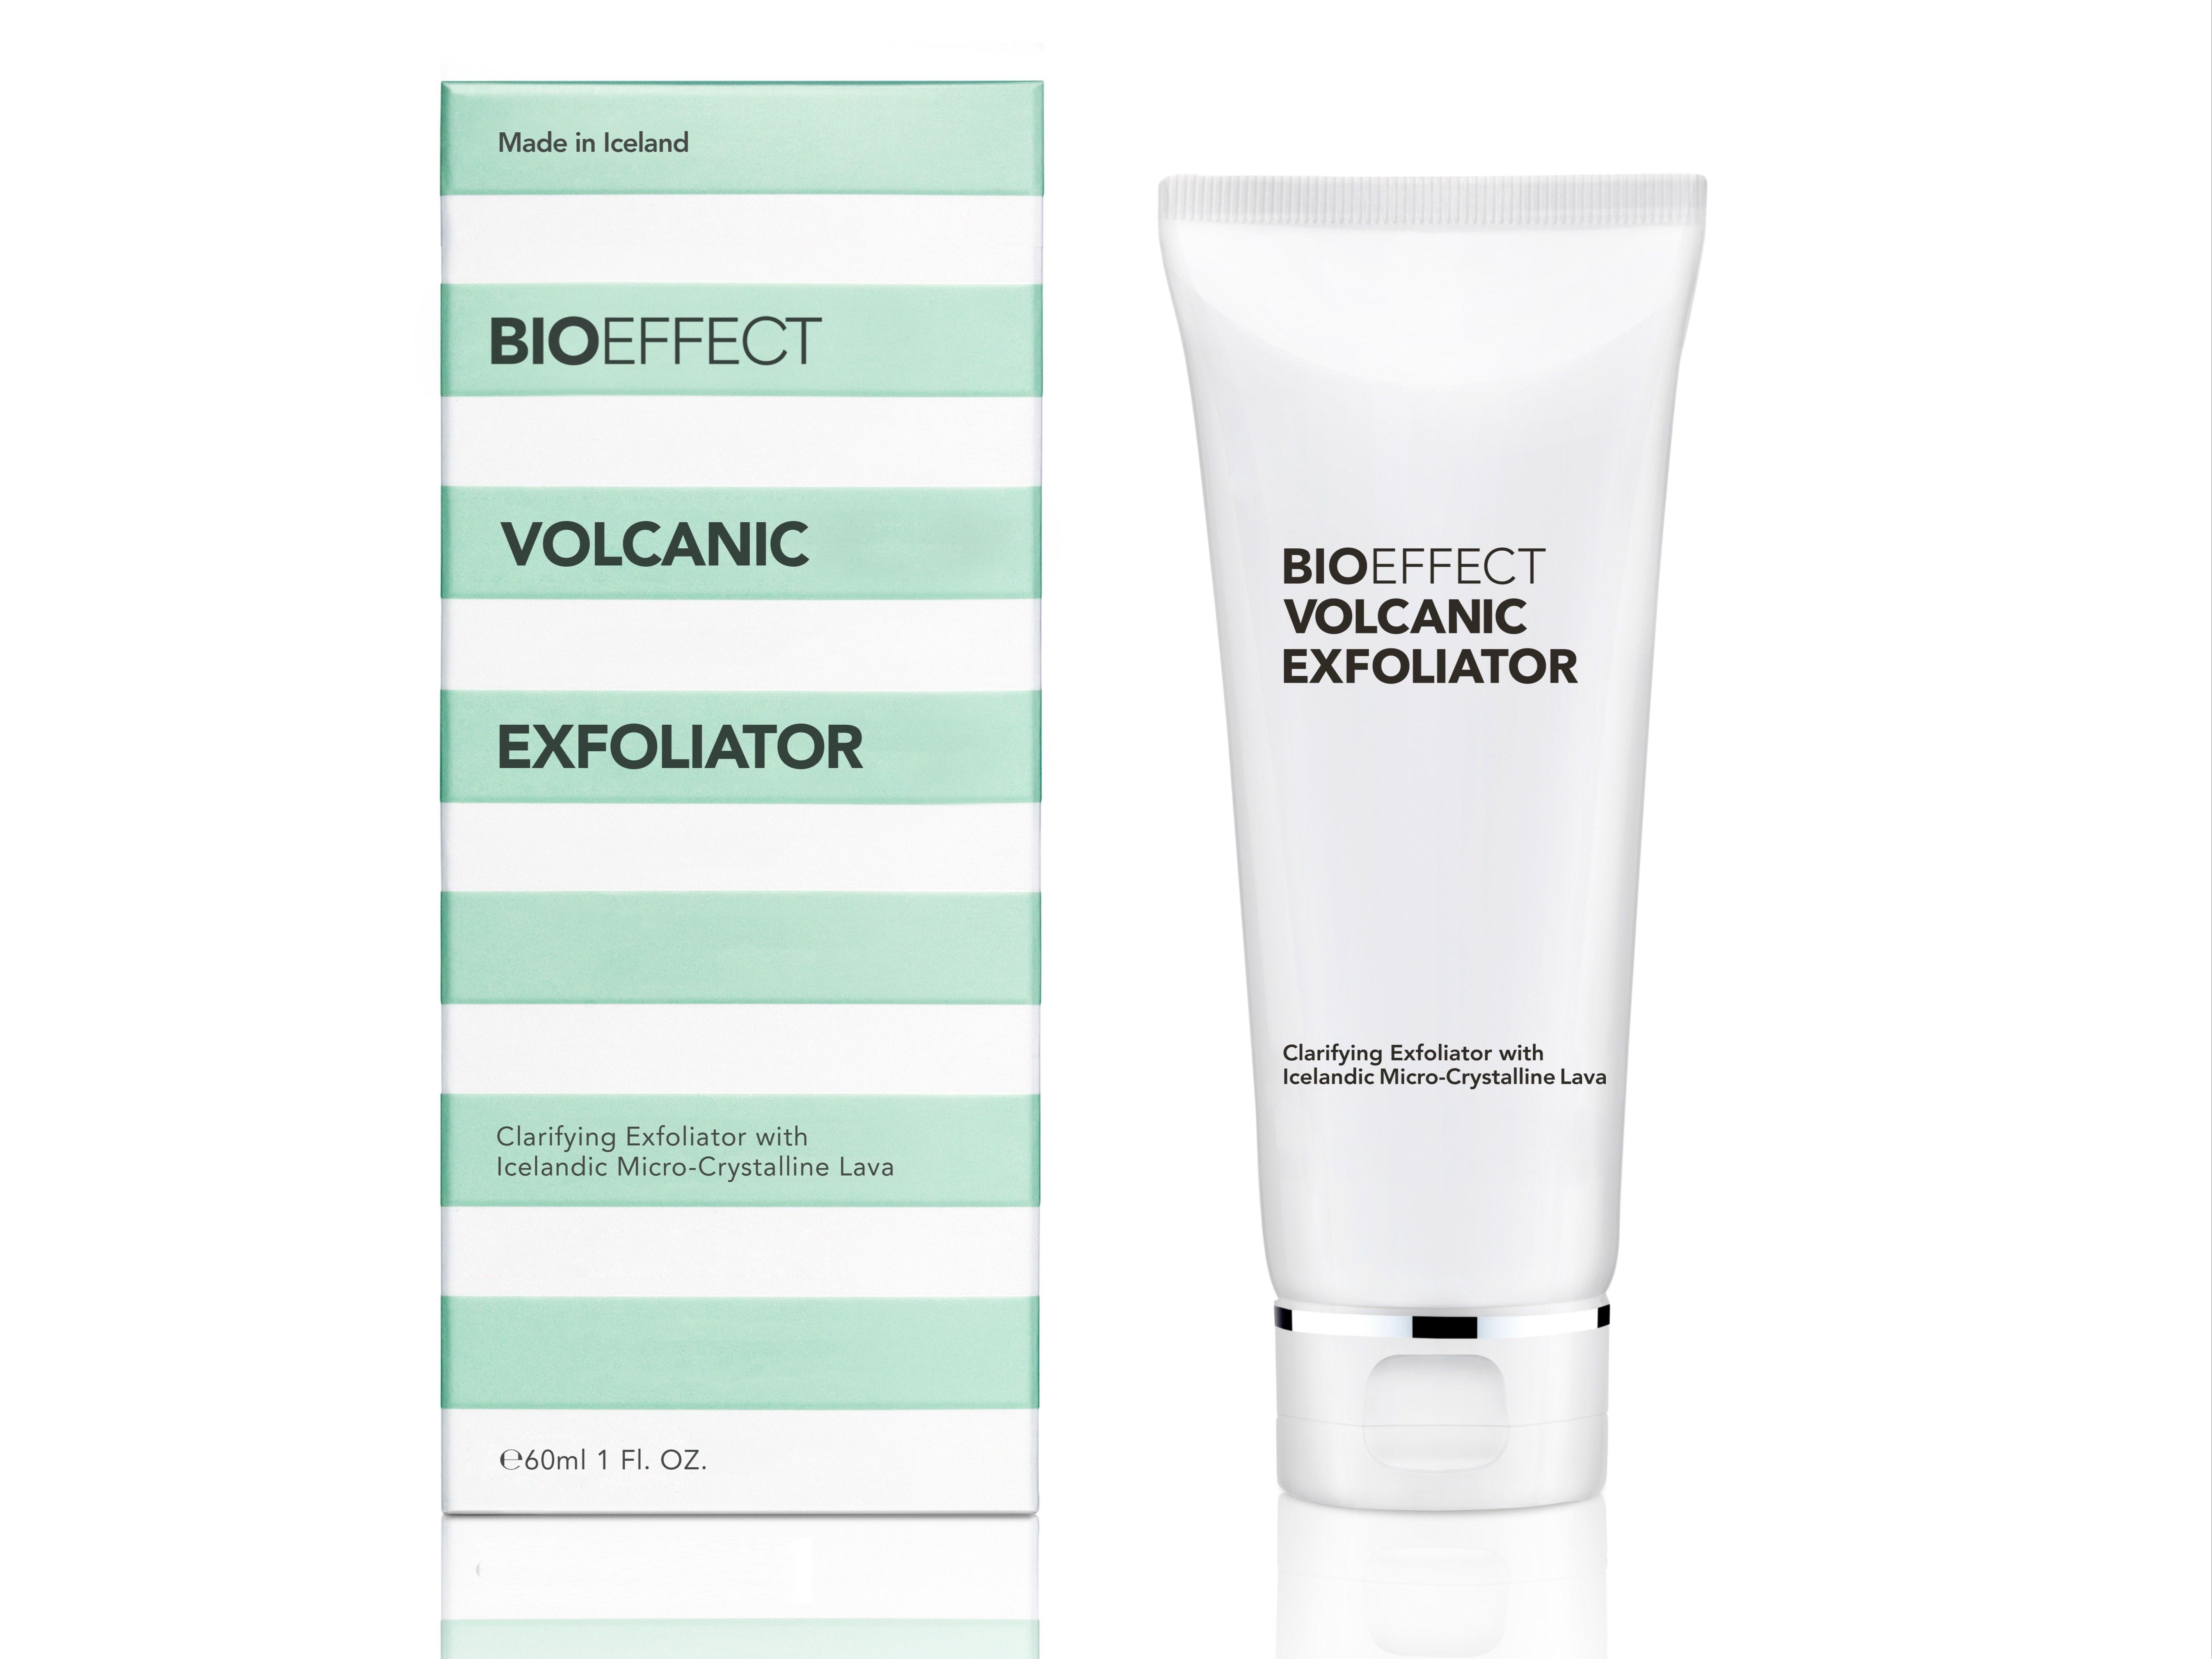 Exfoliant Bioeffect